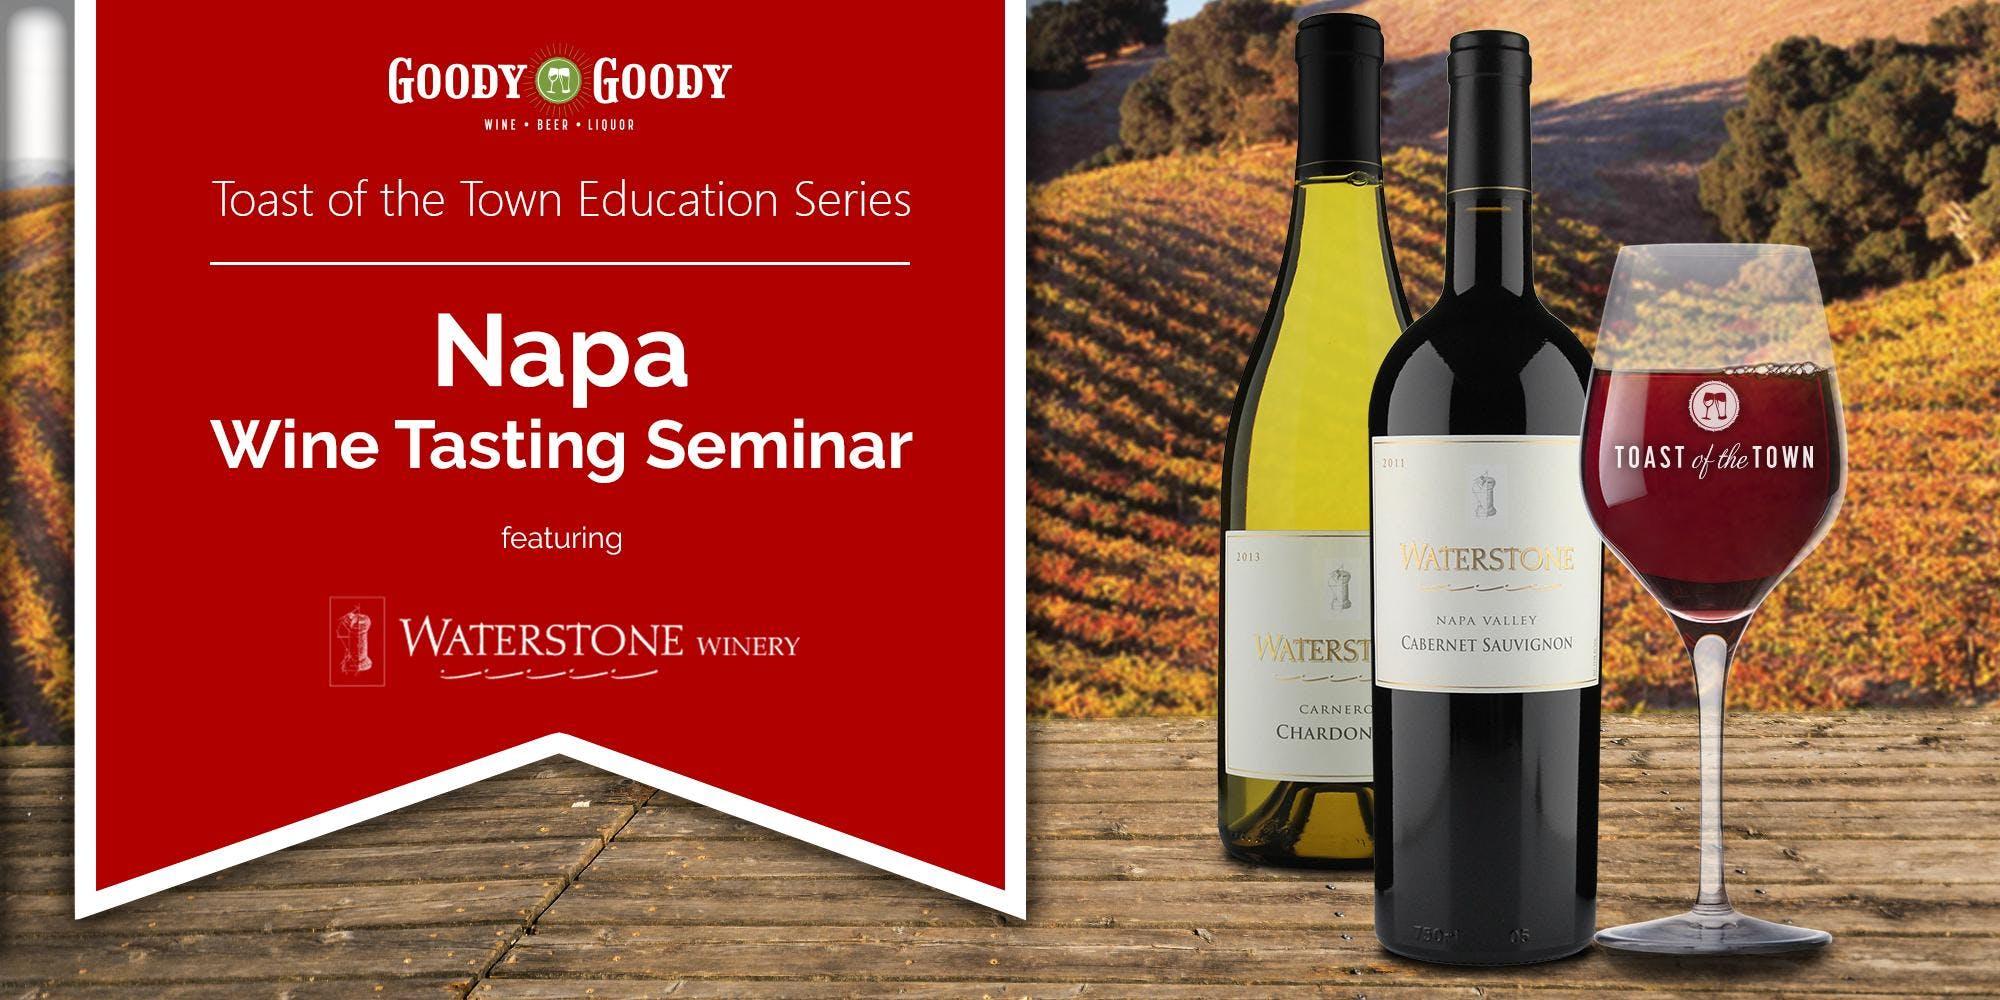 Napa Wine Tasting Seminar with Waterstone Win